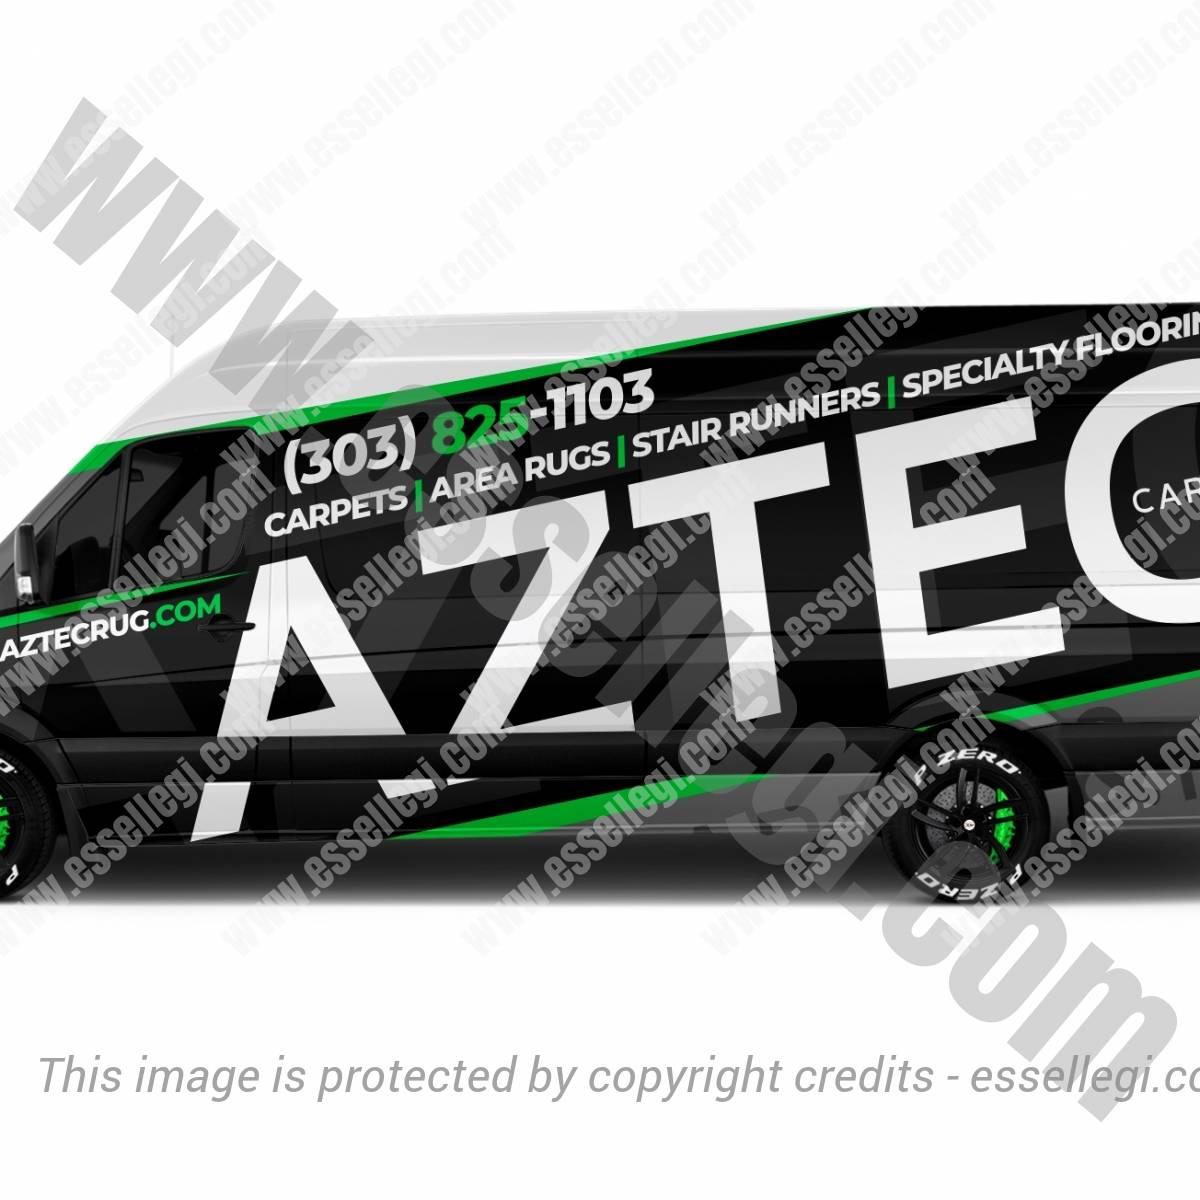 AZTEC CARPET & RUG | VAN WRAP DESIGN  🇺🇸